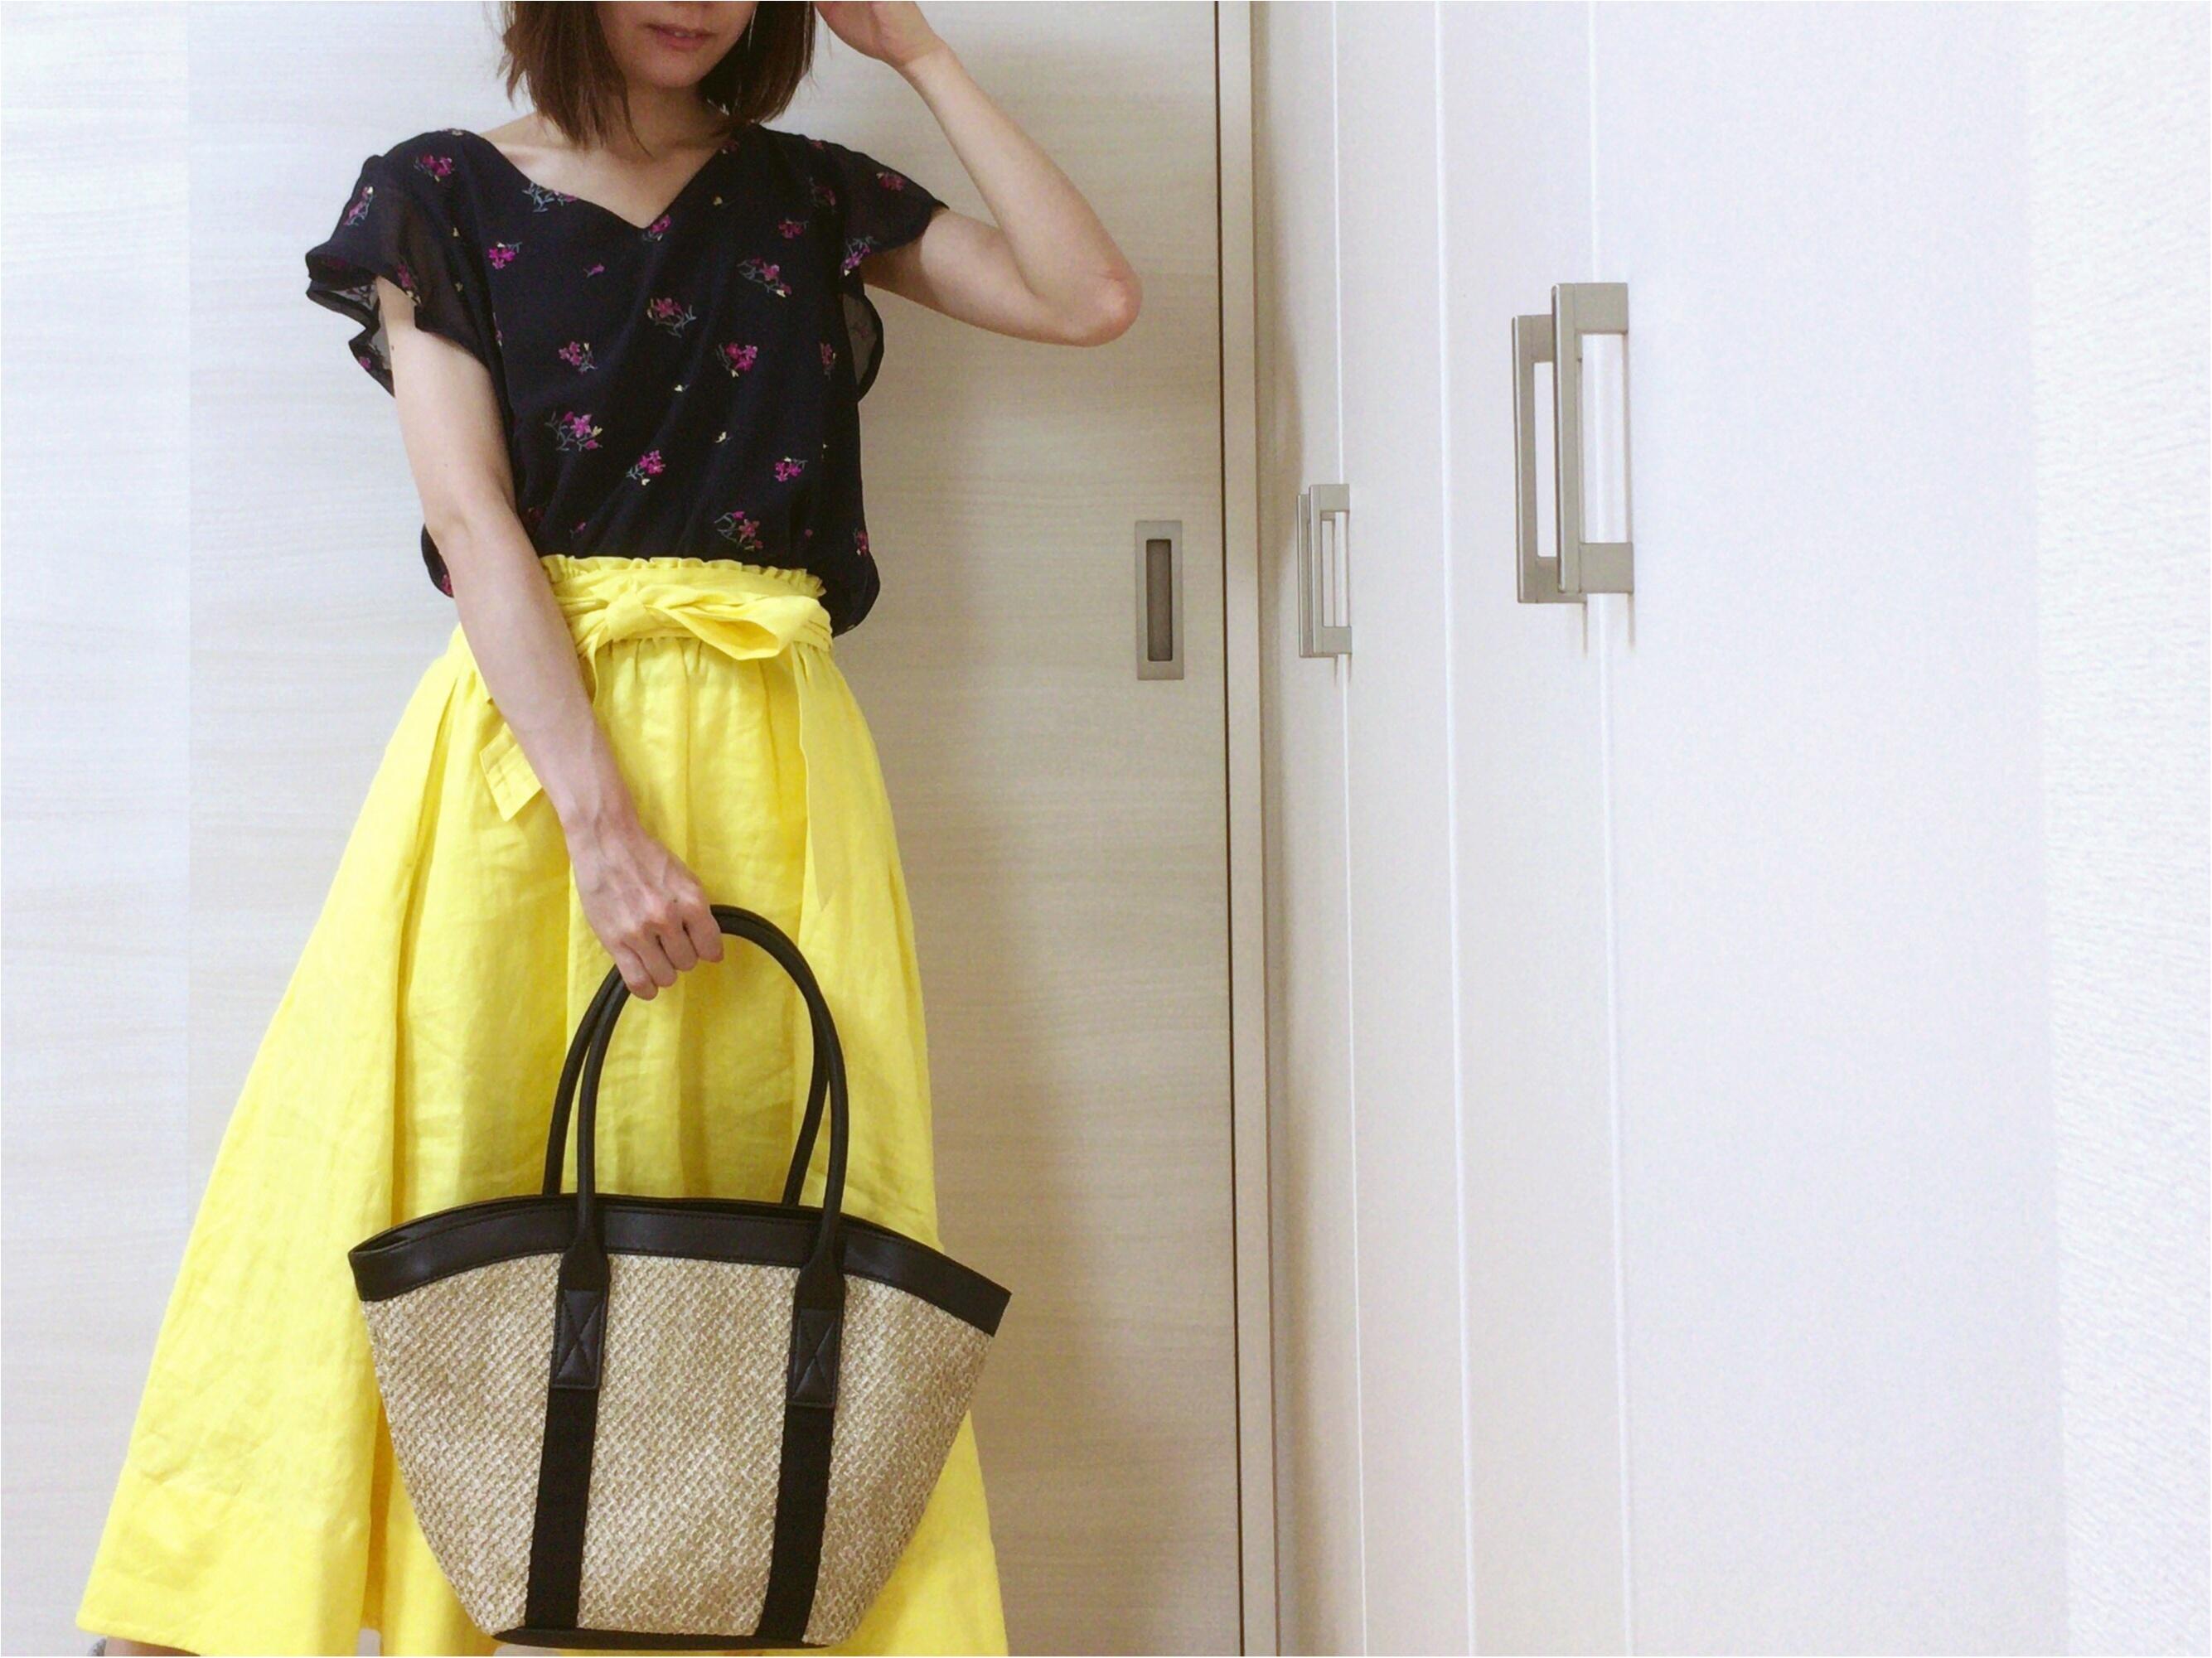 【SALE】990円!GU《カゴトートバッグ》可愛い♡夏ファッション必須アイテムをさらに安く♡_5